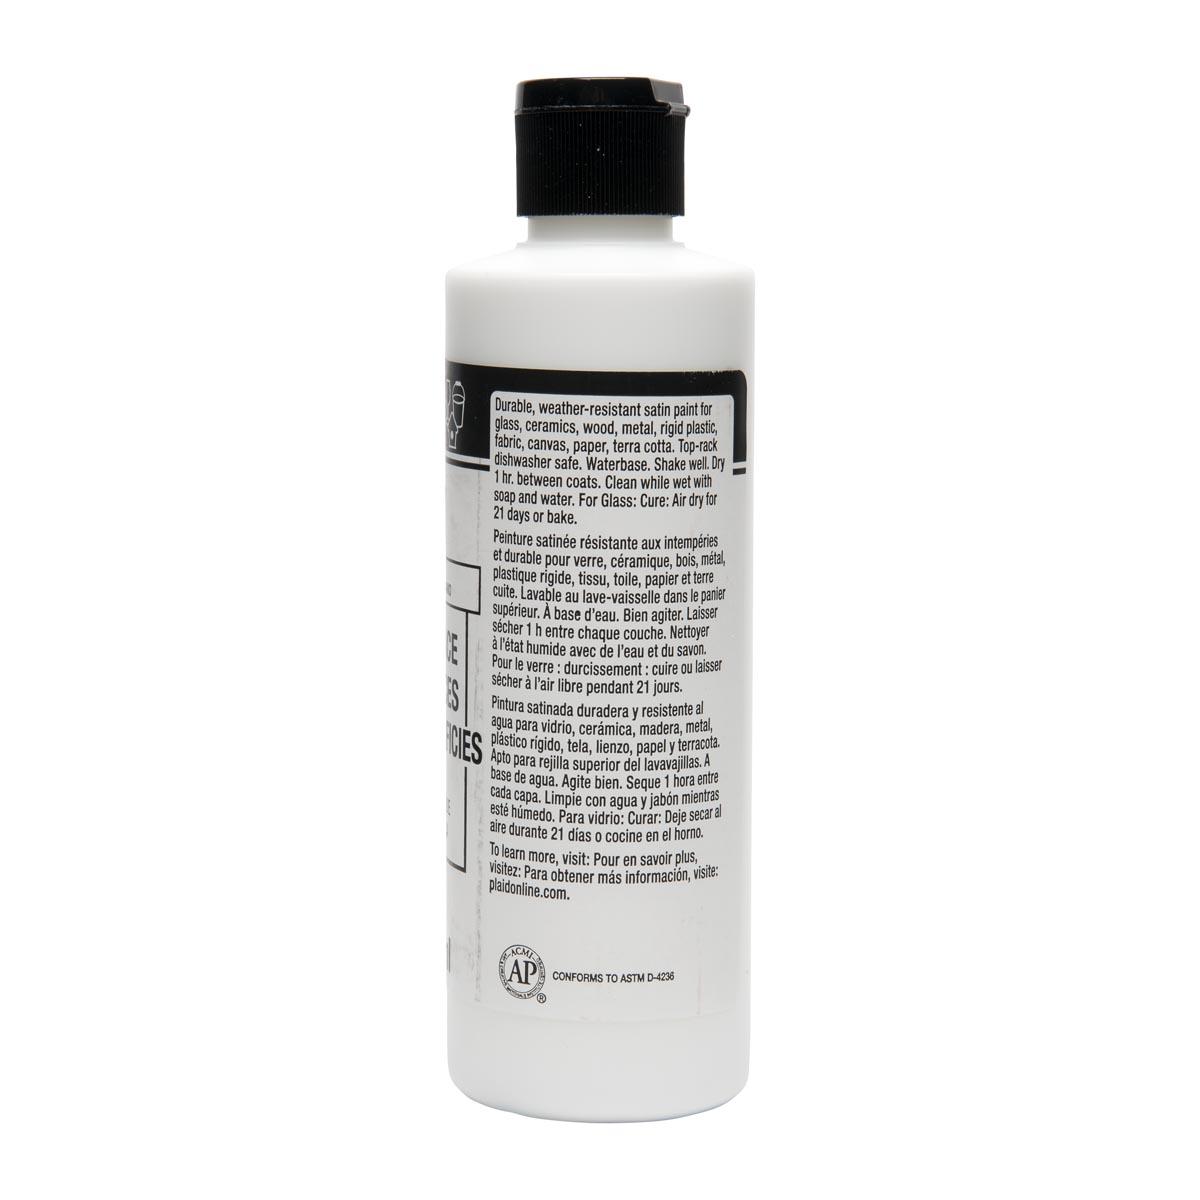 FolkArt ® Multi-Surface Satin Acrylic Paints - Titanium White, 8 oz. - 4645